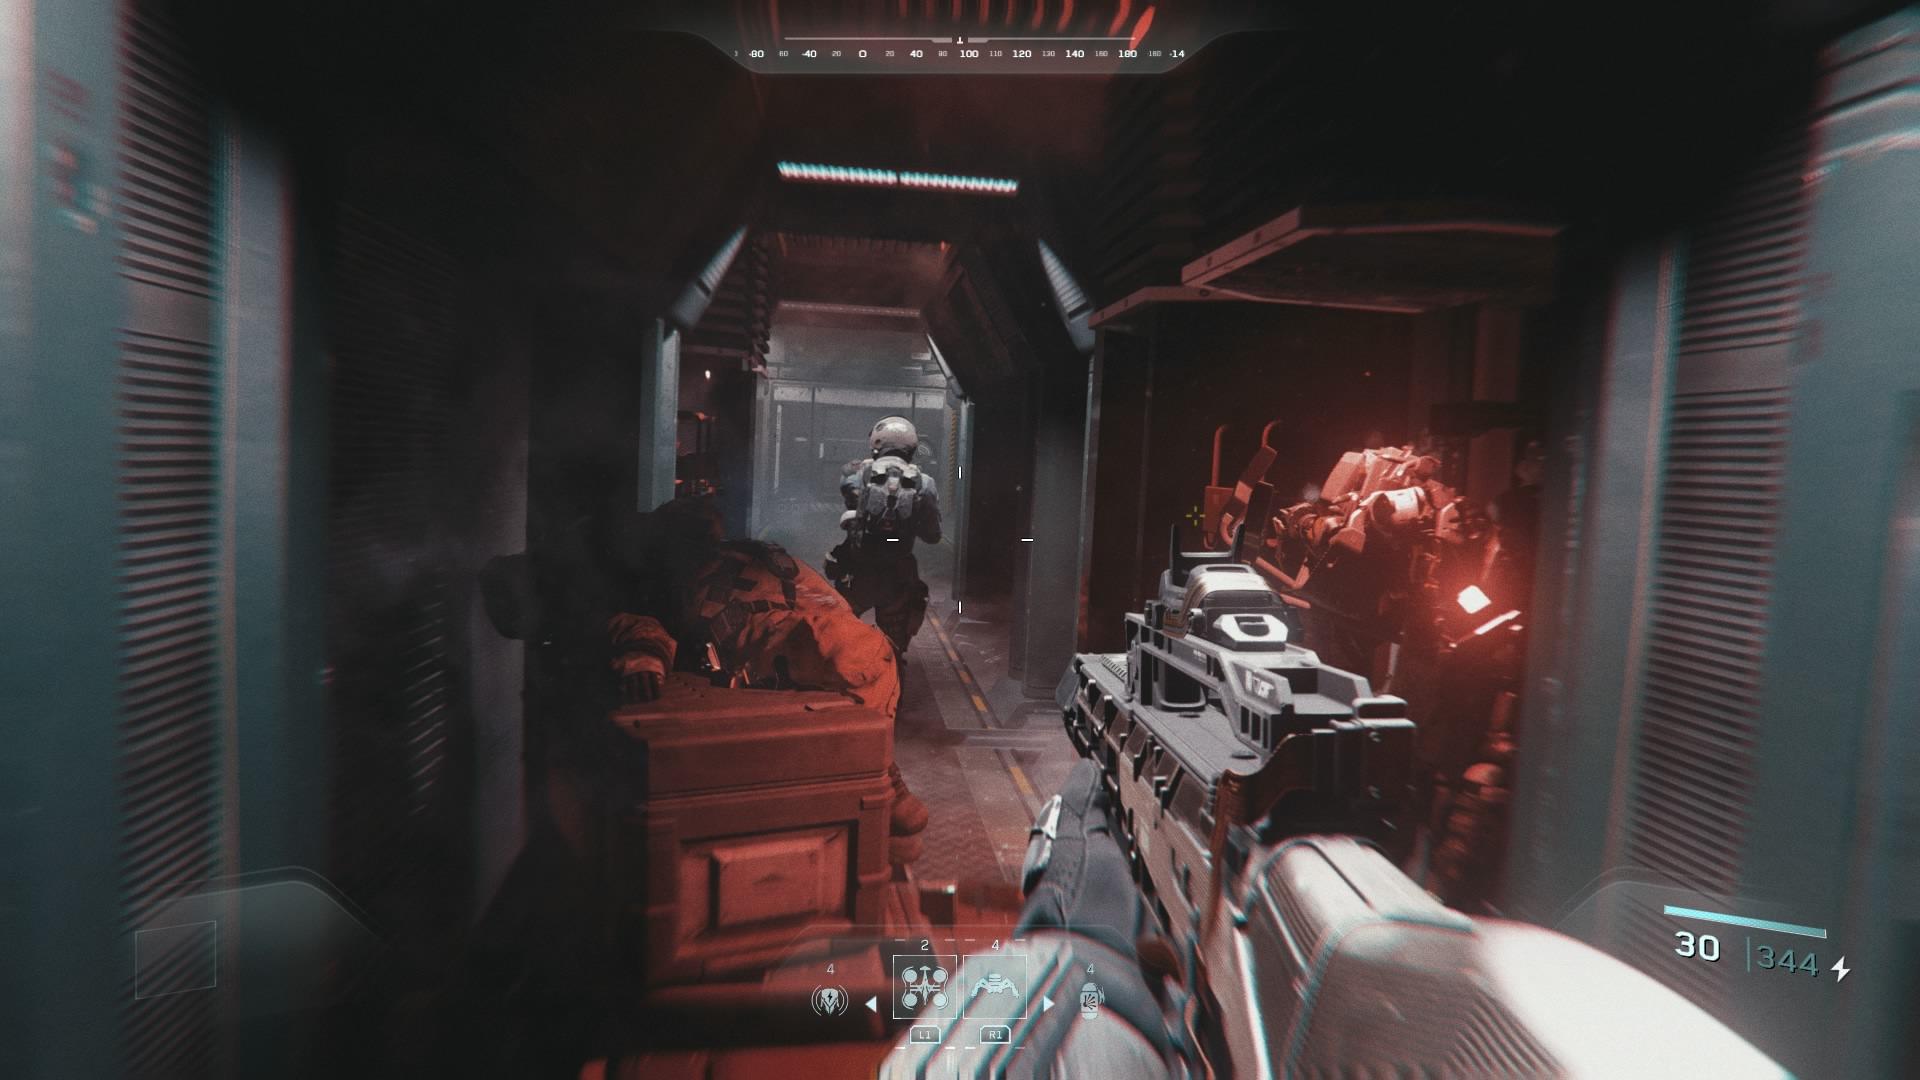 Is Call of Duty: Infinite Warfare the best CoD yet?